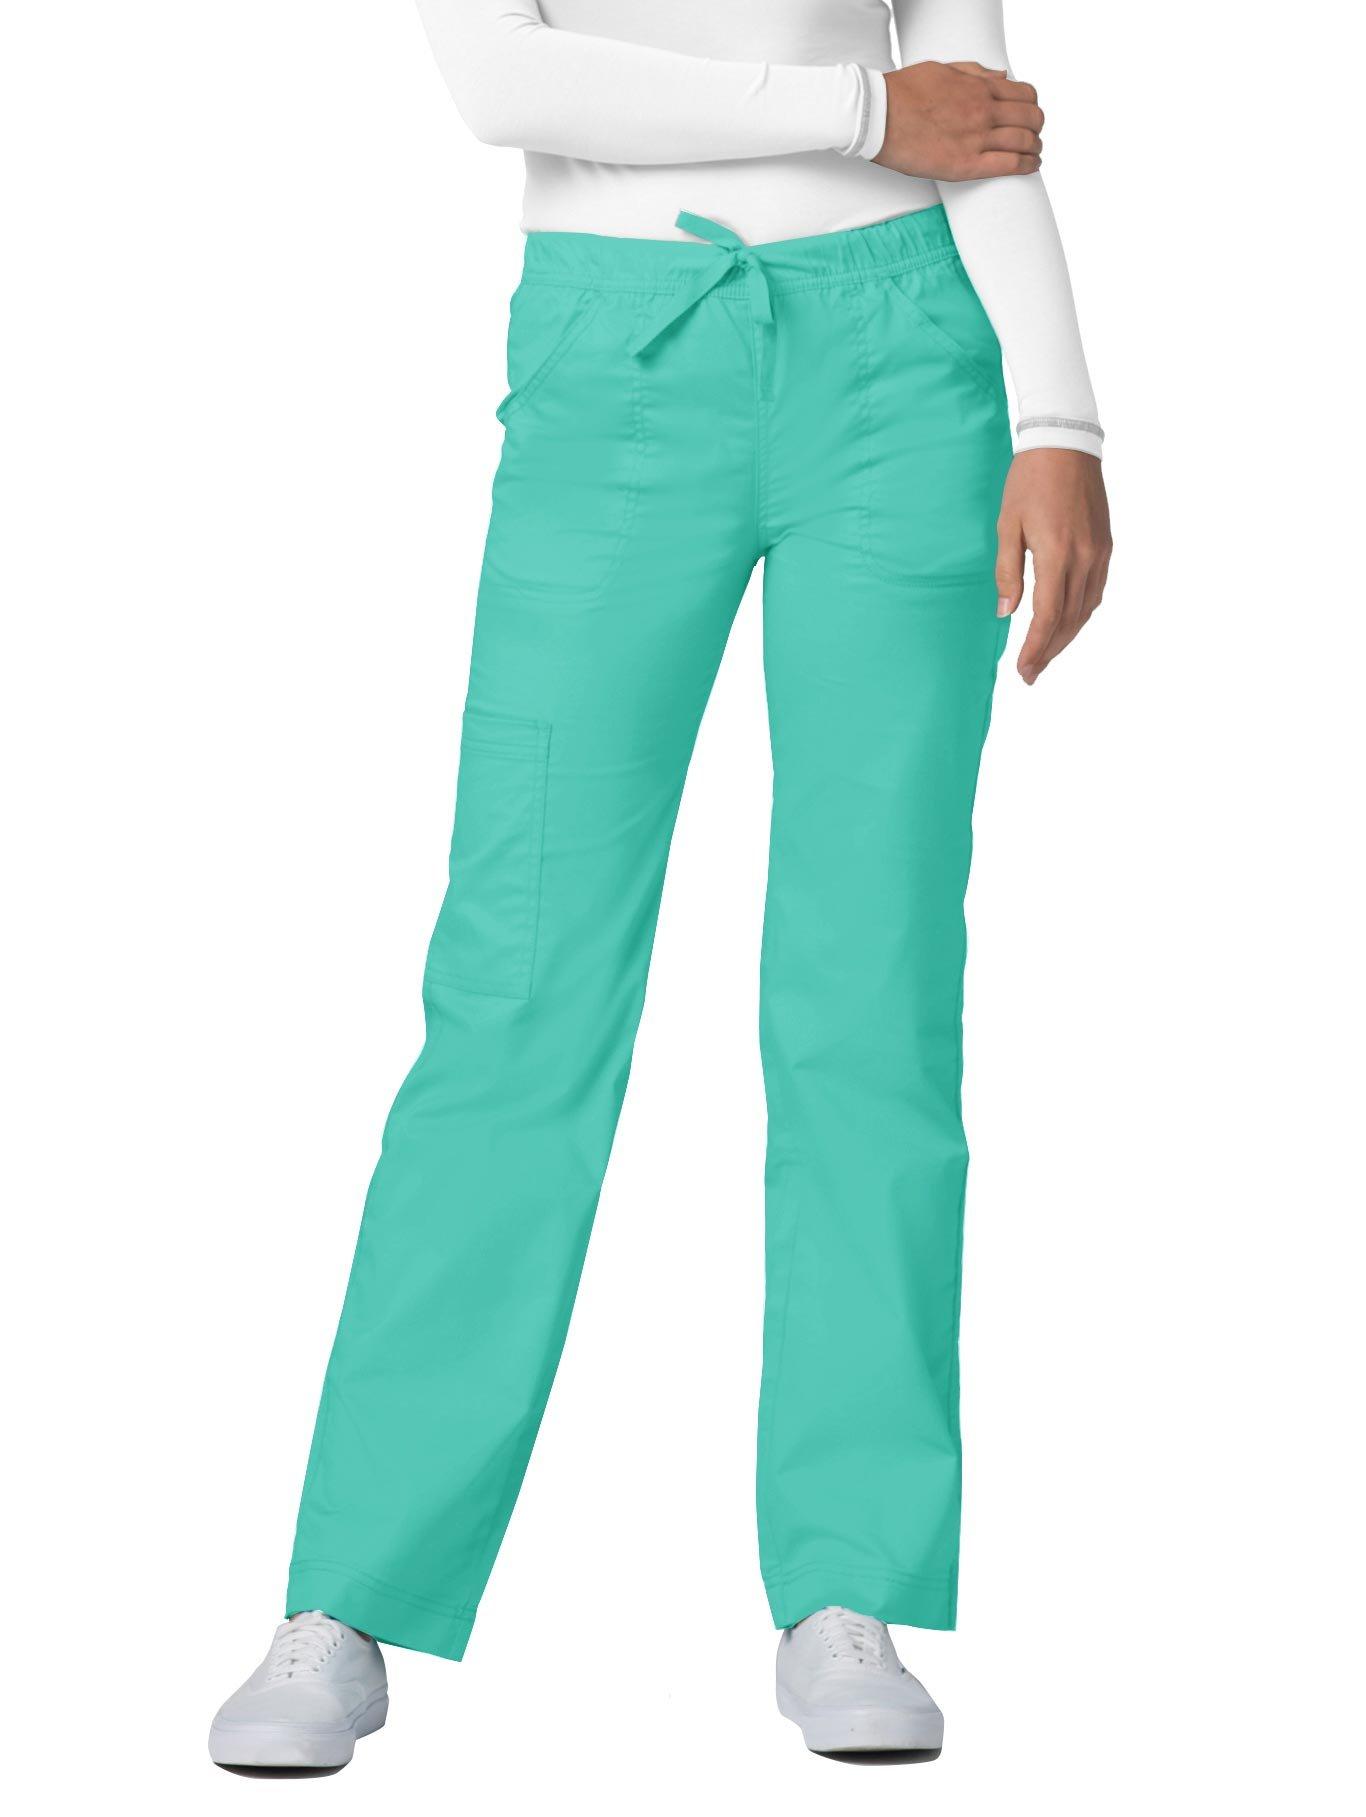 Adar Pop-Stretch Junior Fit Mid Rise Straight Leg Drawstring Cargo Pants - 3106 - Sea Glass - S